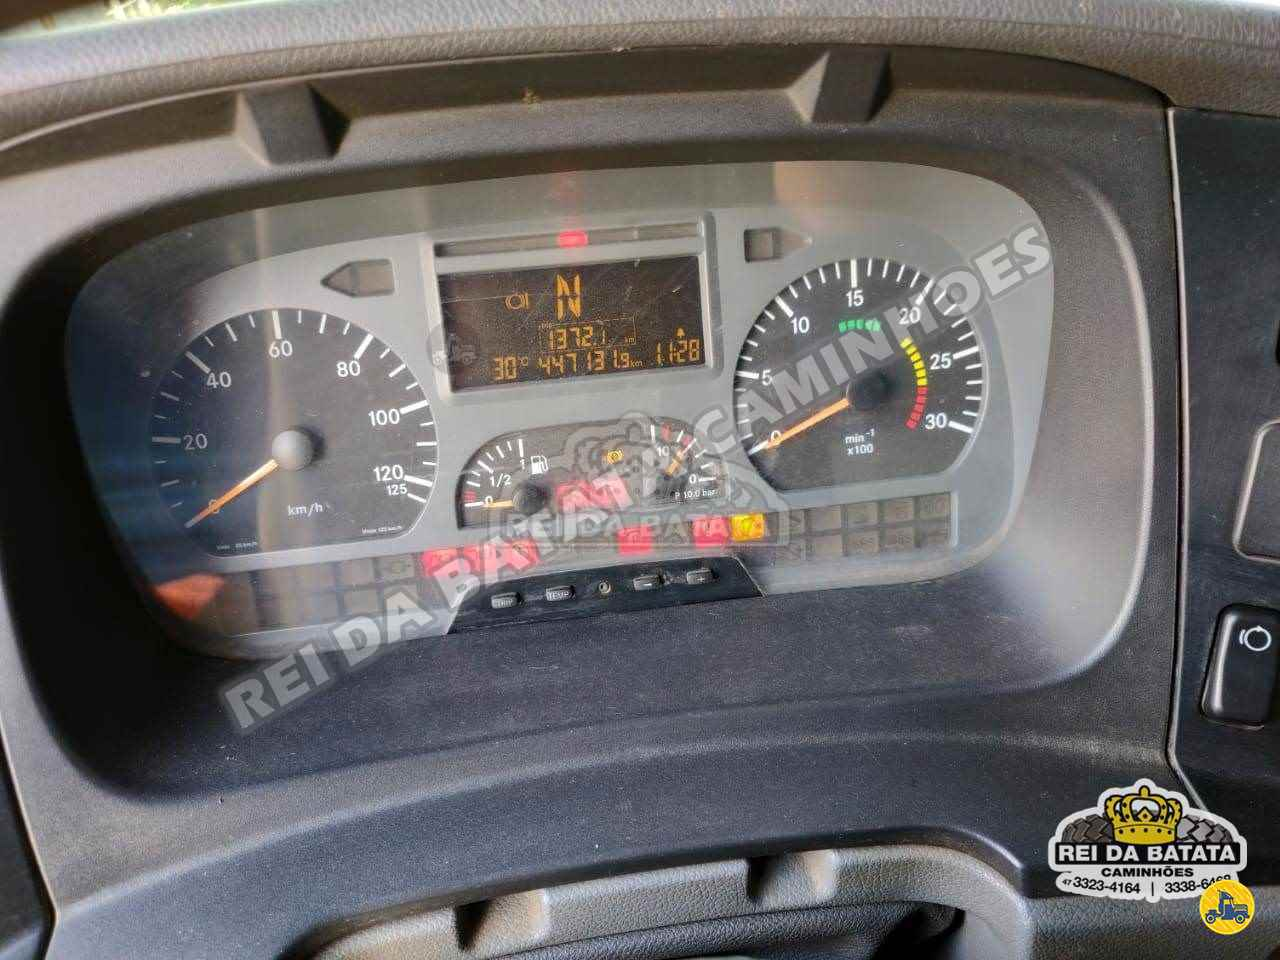 MERCEDES-BENZ MB 1315 447000km 2008/2008 Rei da Batata Caminhões